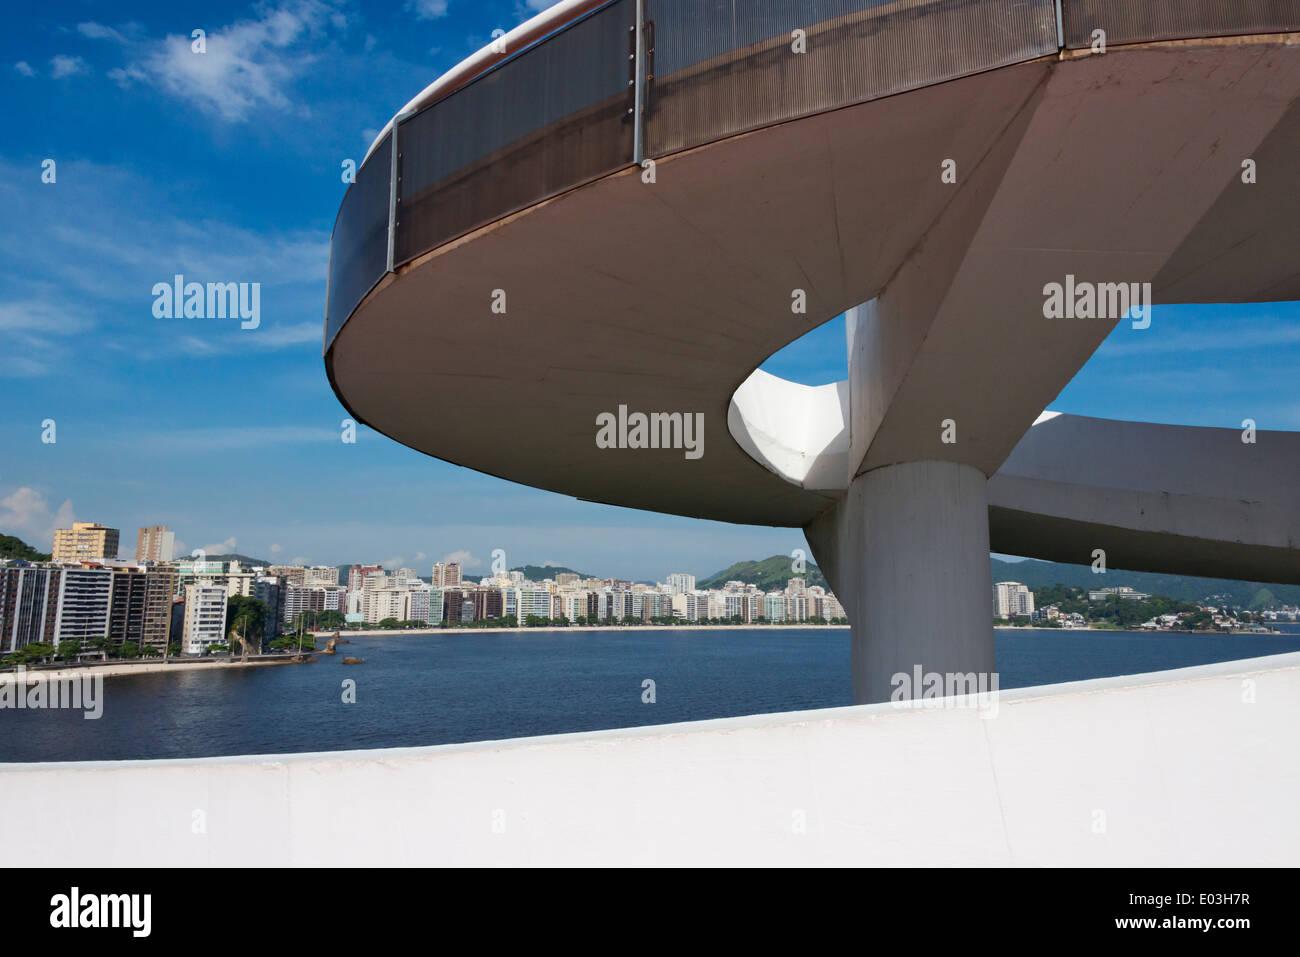 Niteroi Museo di Arte Contemporanea (Museu de Arte Contemporanea de Niteroi-MAC) progettato da Oscar Niemeyer, Rio de Janeiro, Brasile Immagini Stock